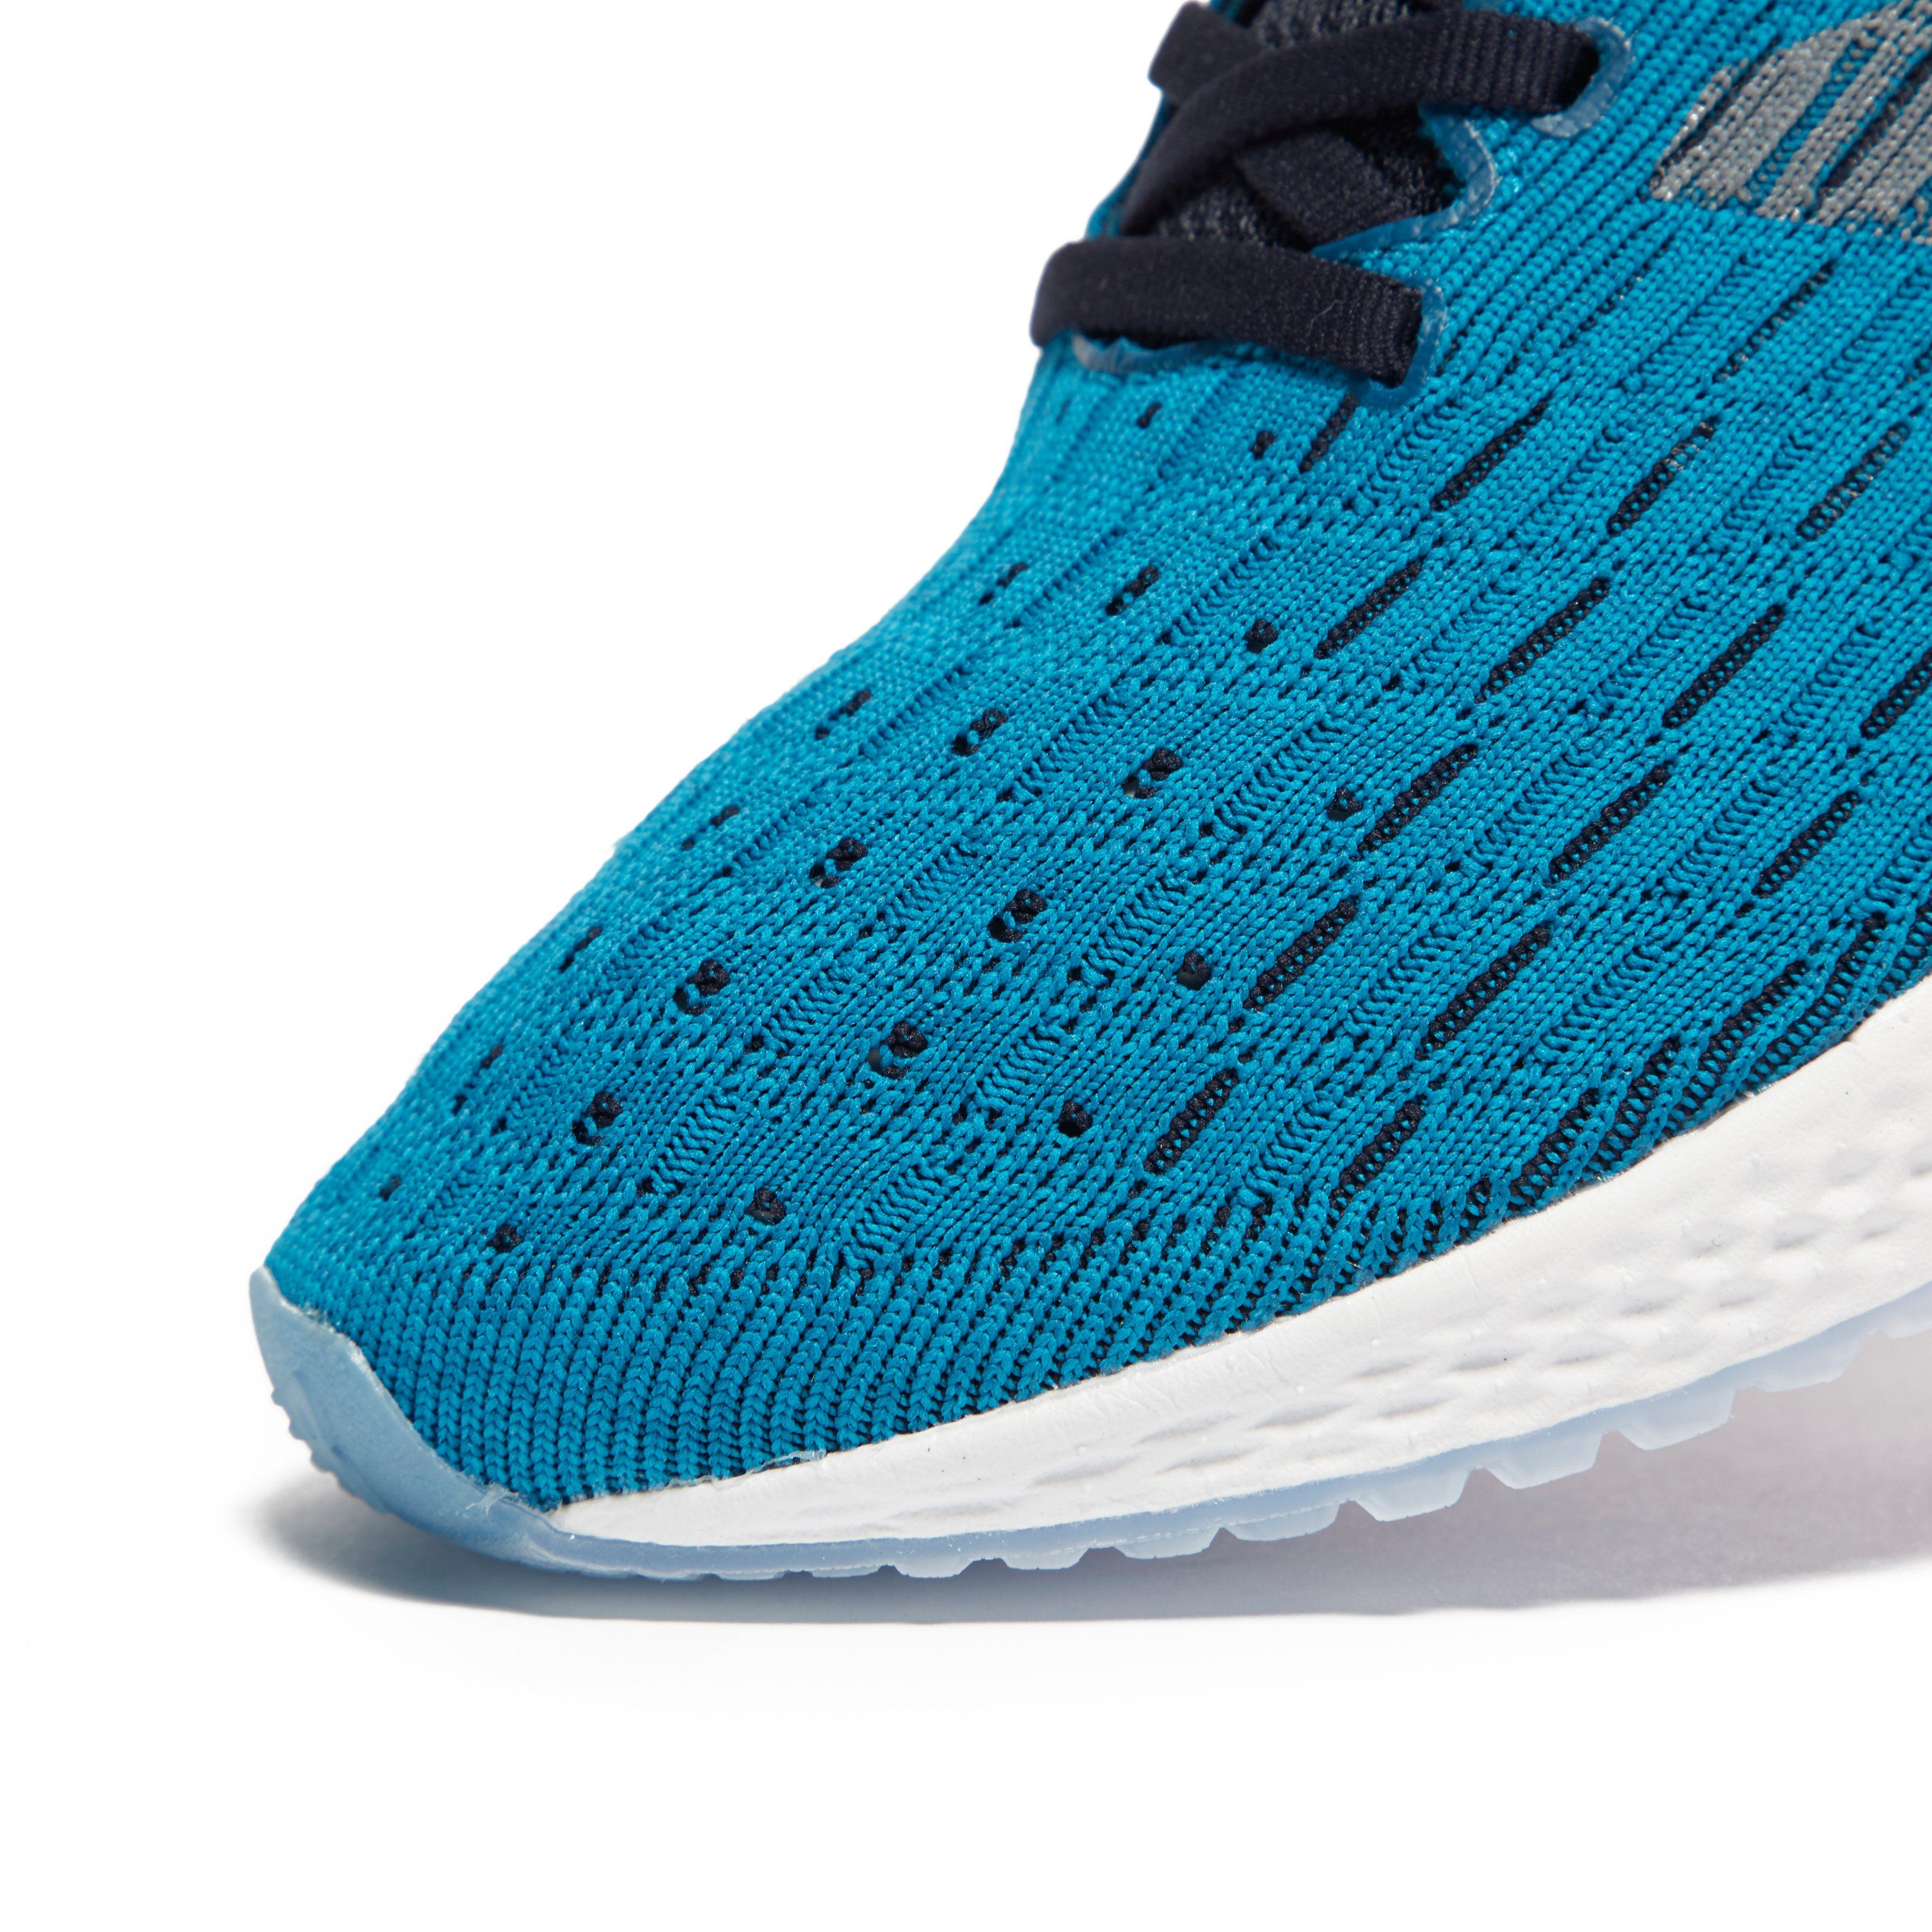 New Balance Fresh Foam Zante Pursuit Men's Running Shoes